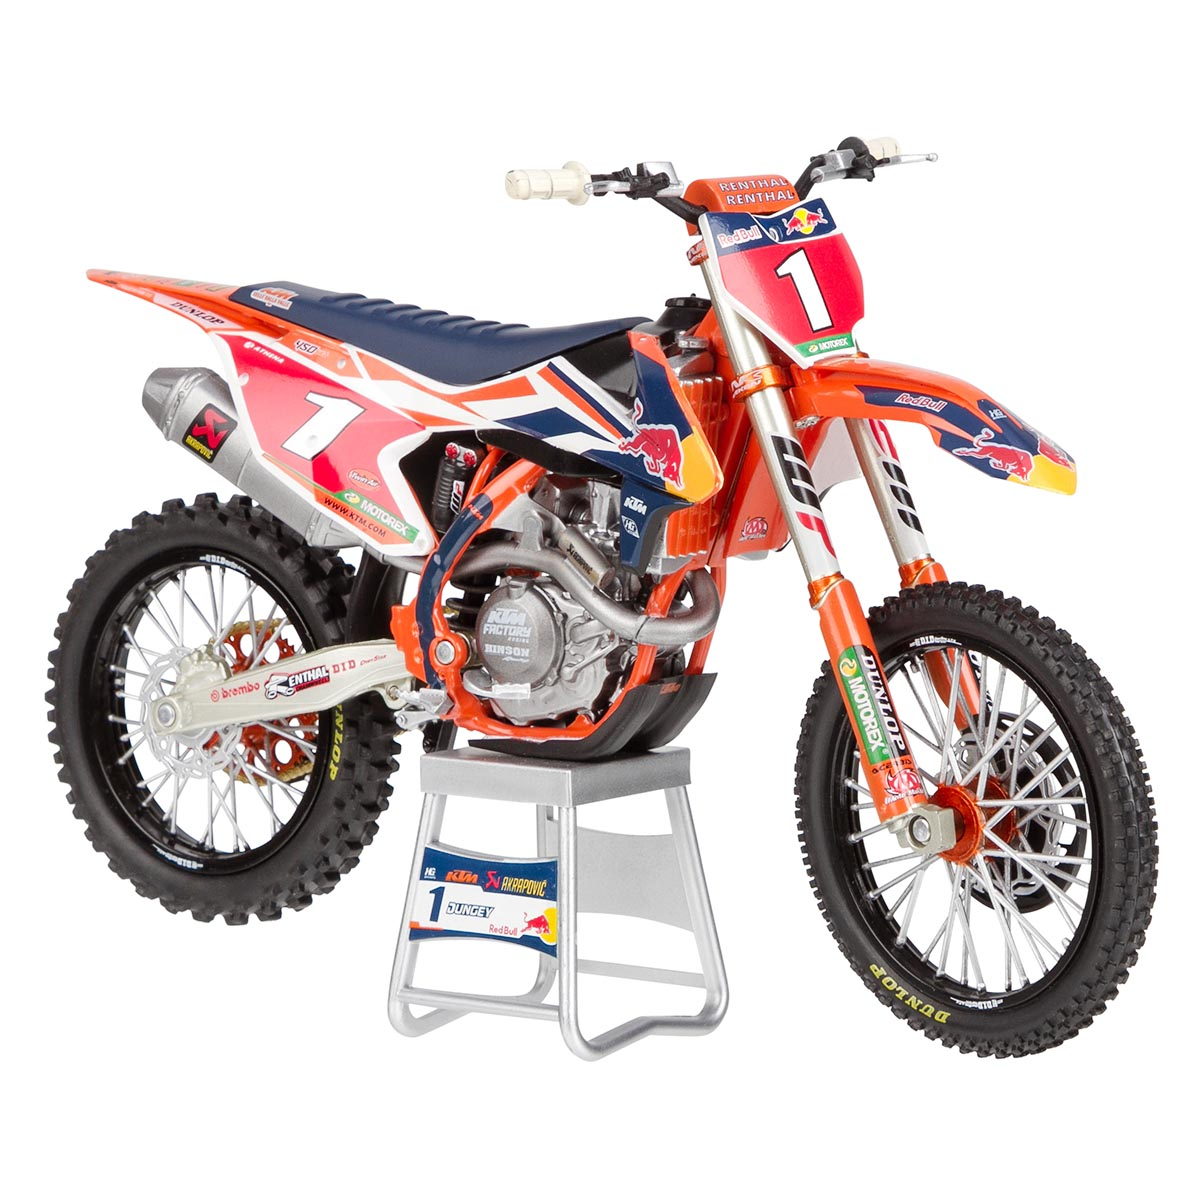 Miniatuur Motorradmodell KTM Ryan Dungey (No 5) 1:12